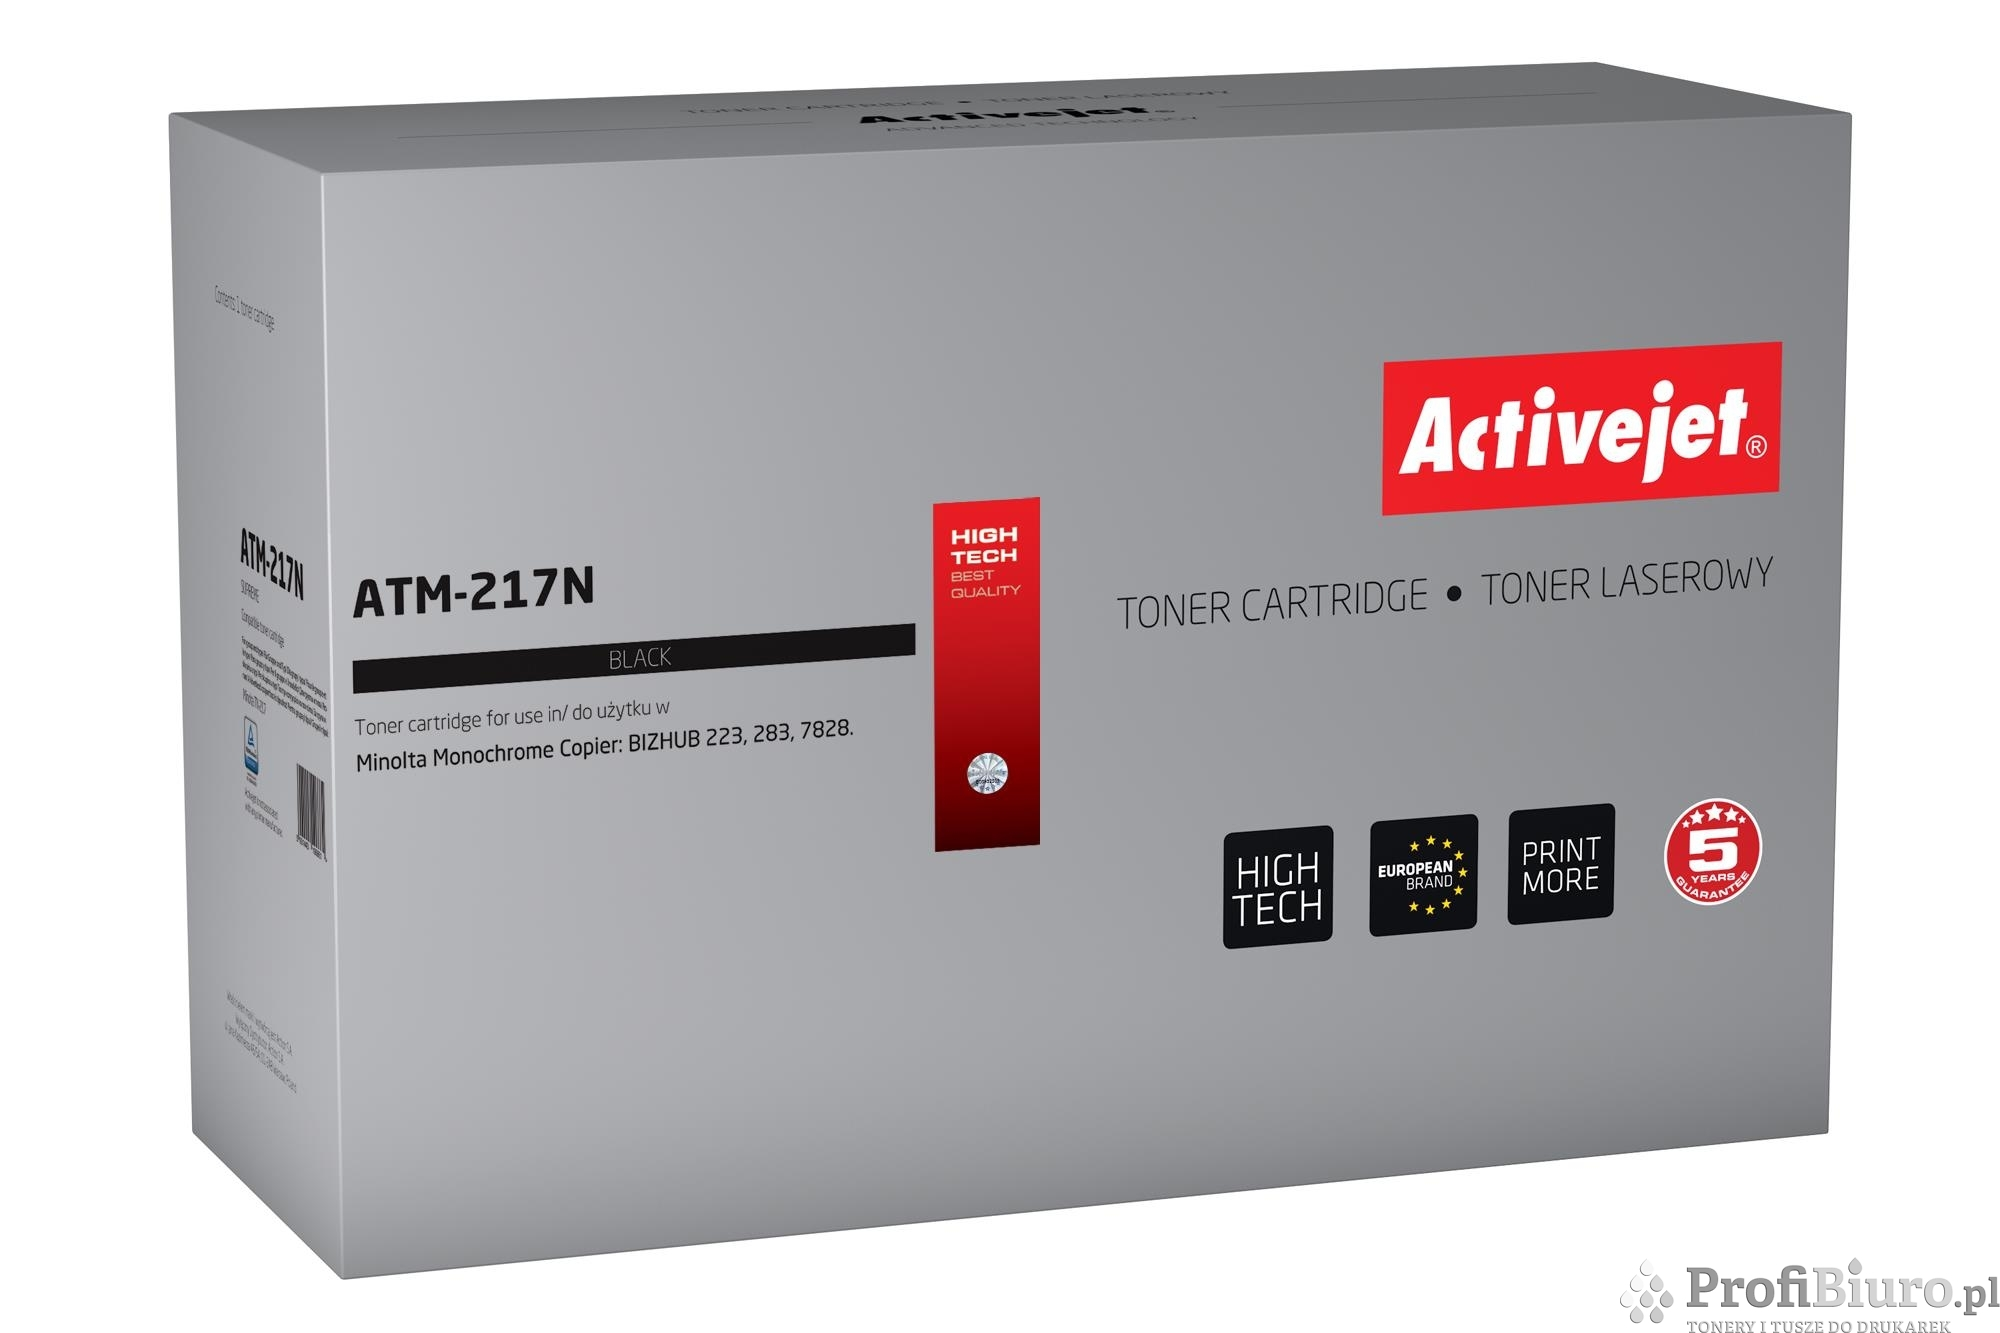 Toner Activejet ATM-217N (zamiennik Konica Minolta A202051; Supreme; 17 500 stron; czarny)